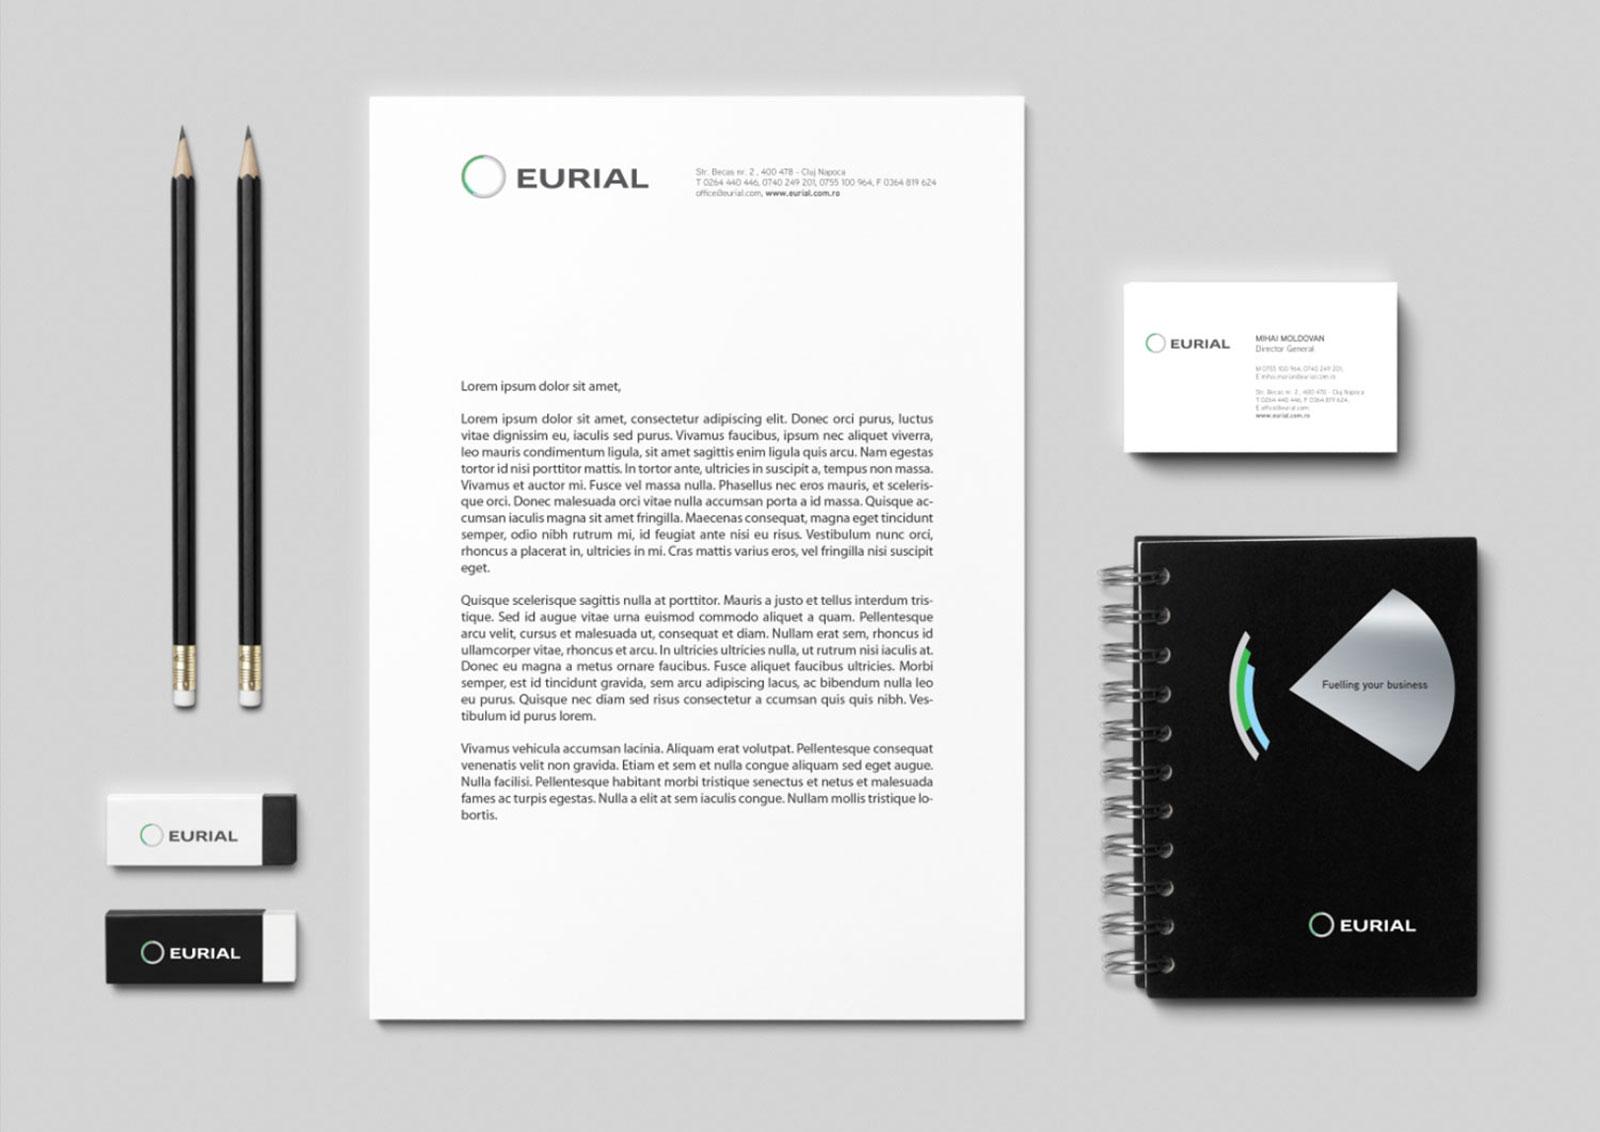 eurial proiect branding inoveo